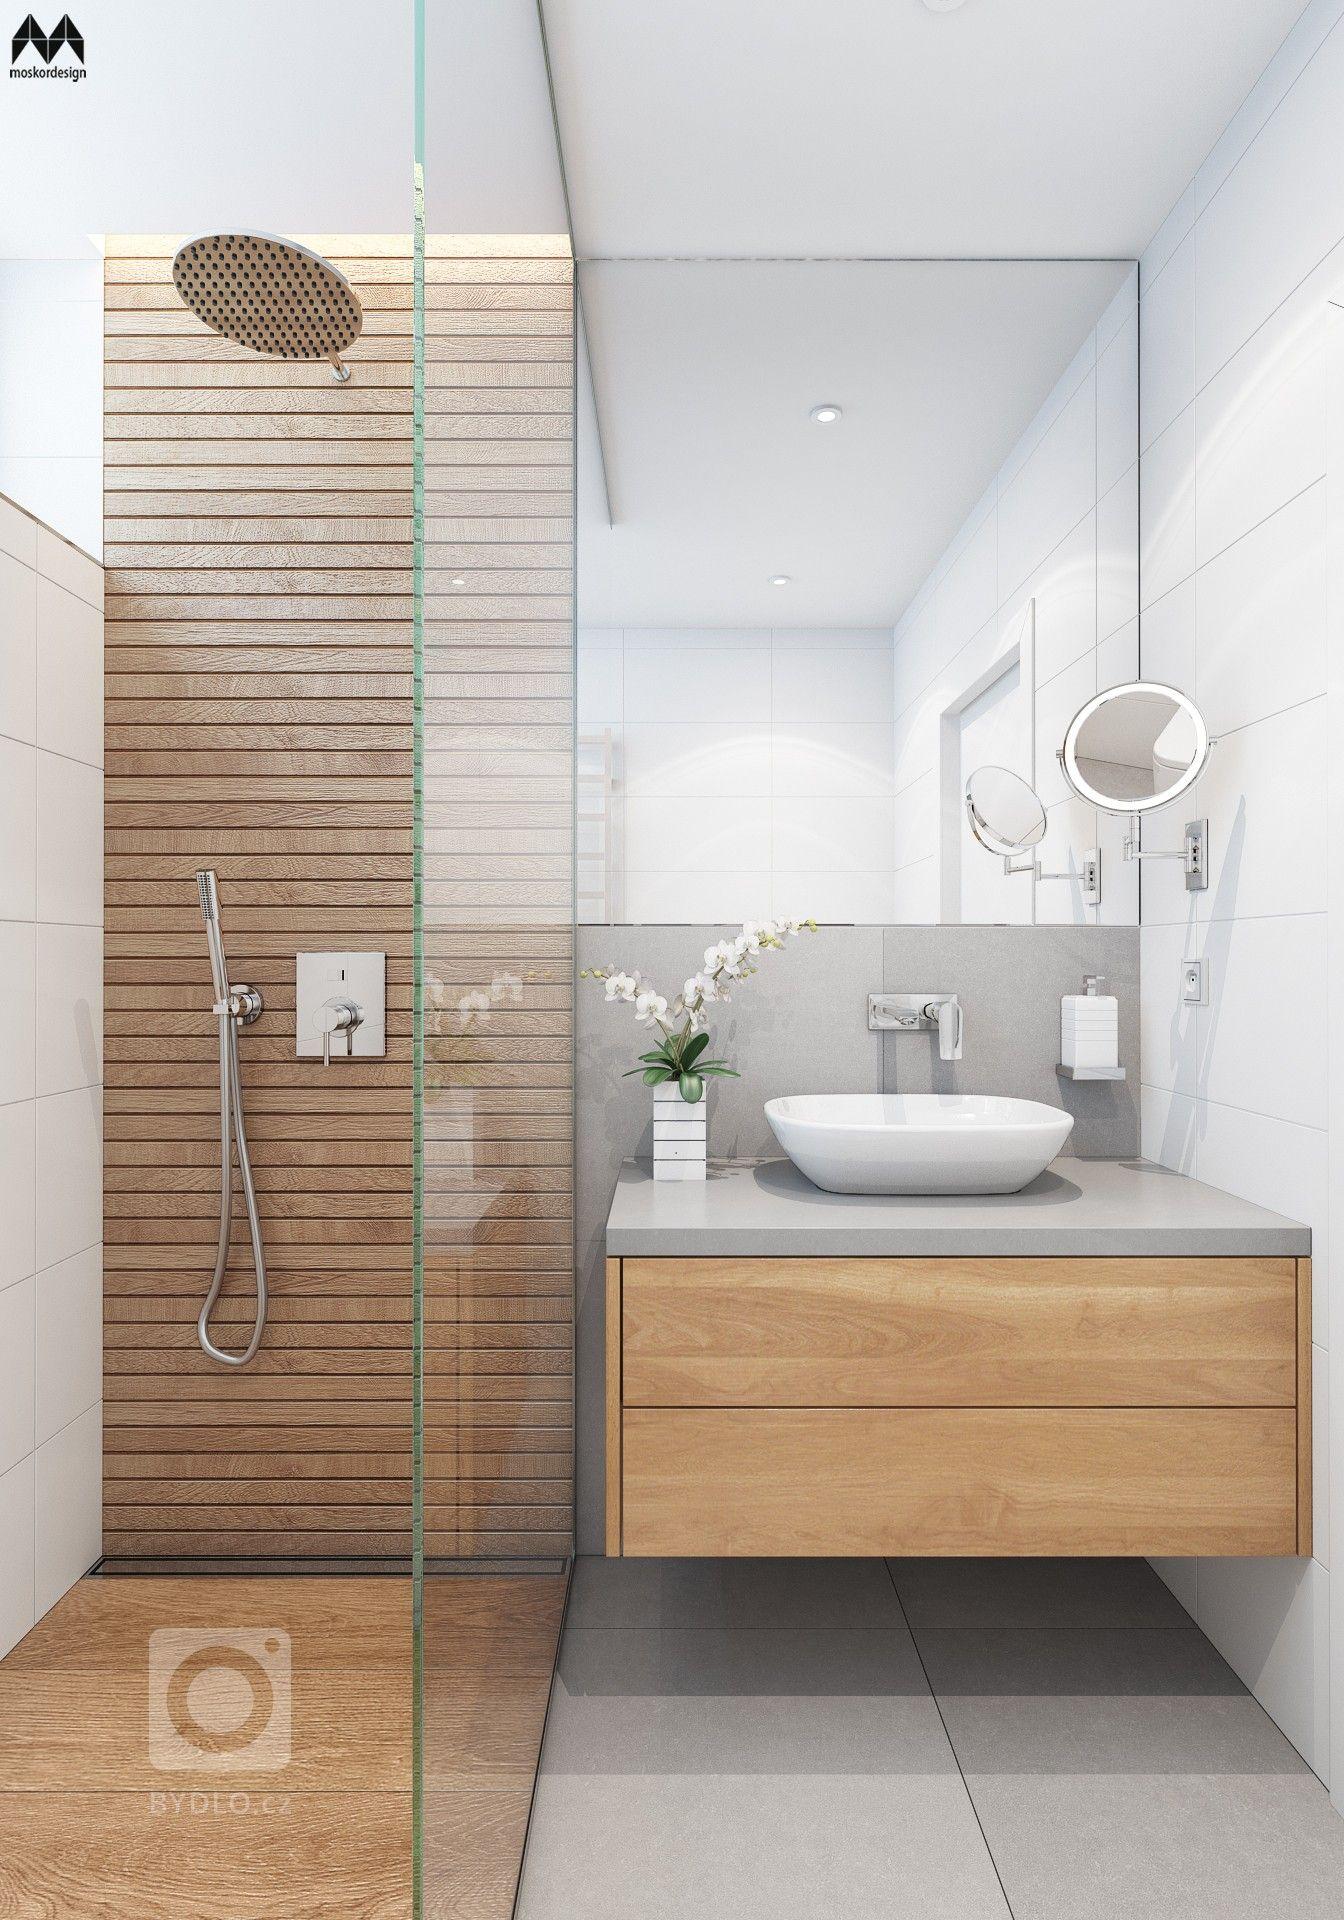 Pin by elena saiz on baños pinterest spa interiors and bath